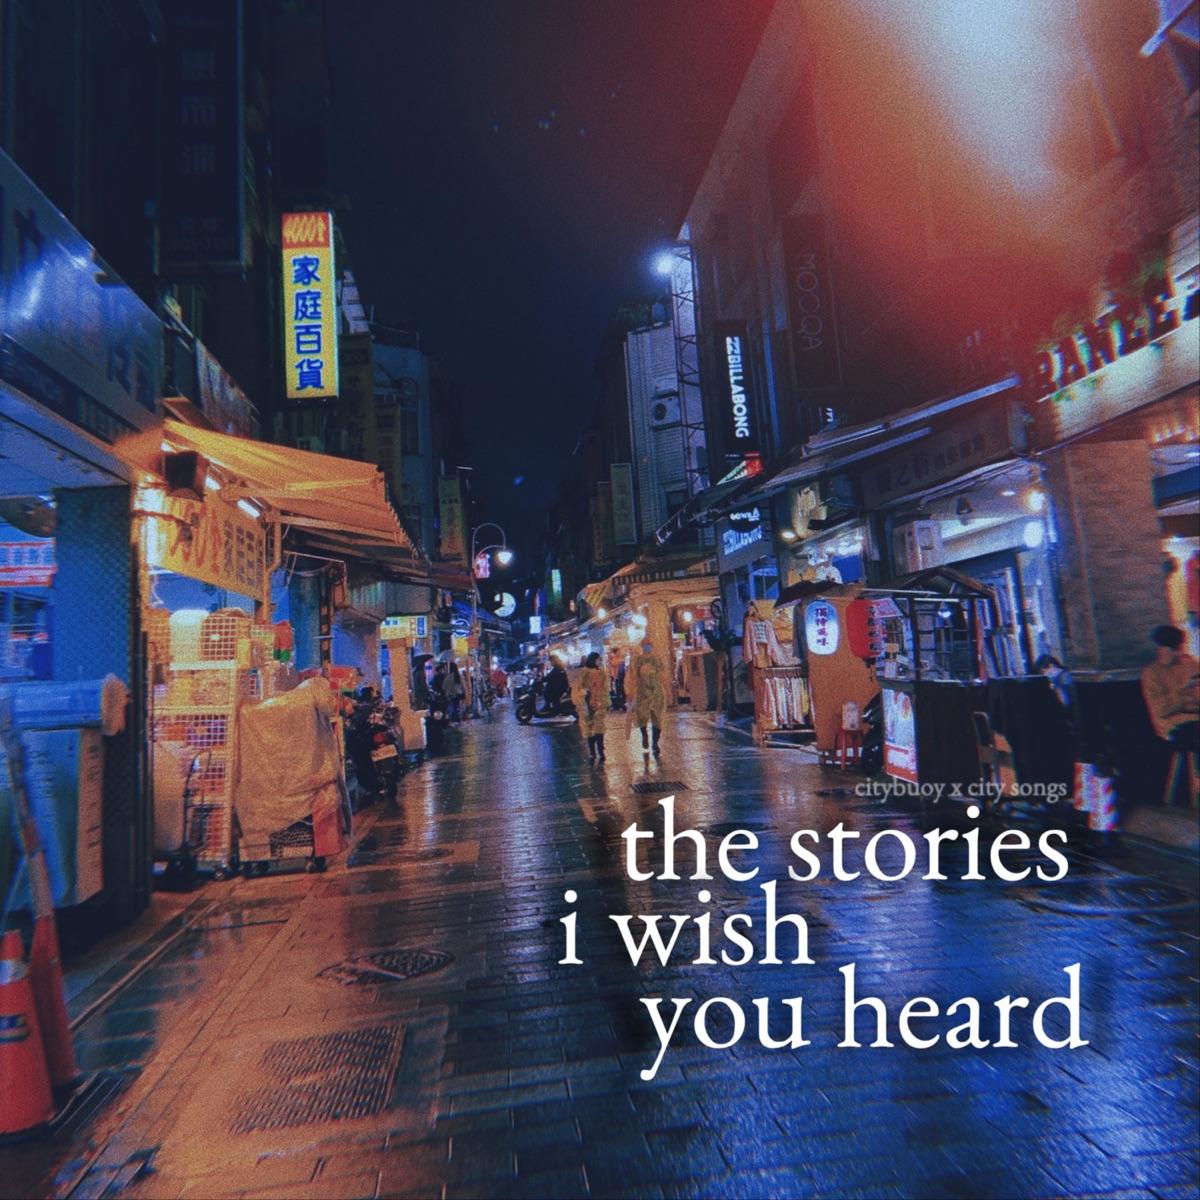 the stories i wish you heard